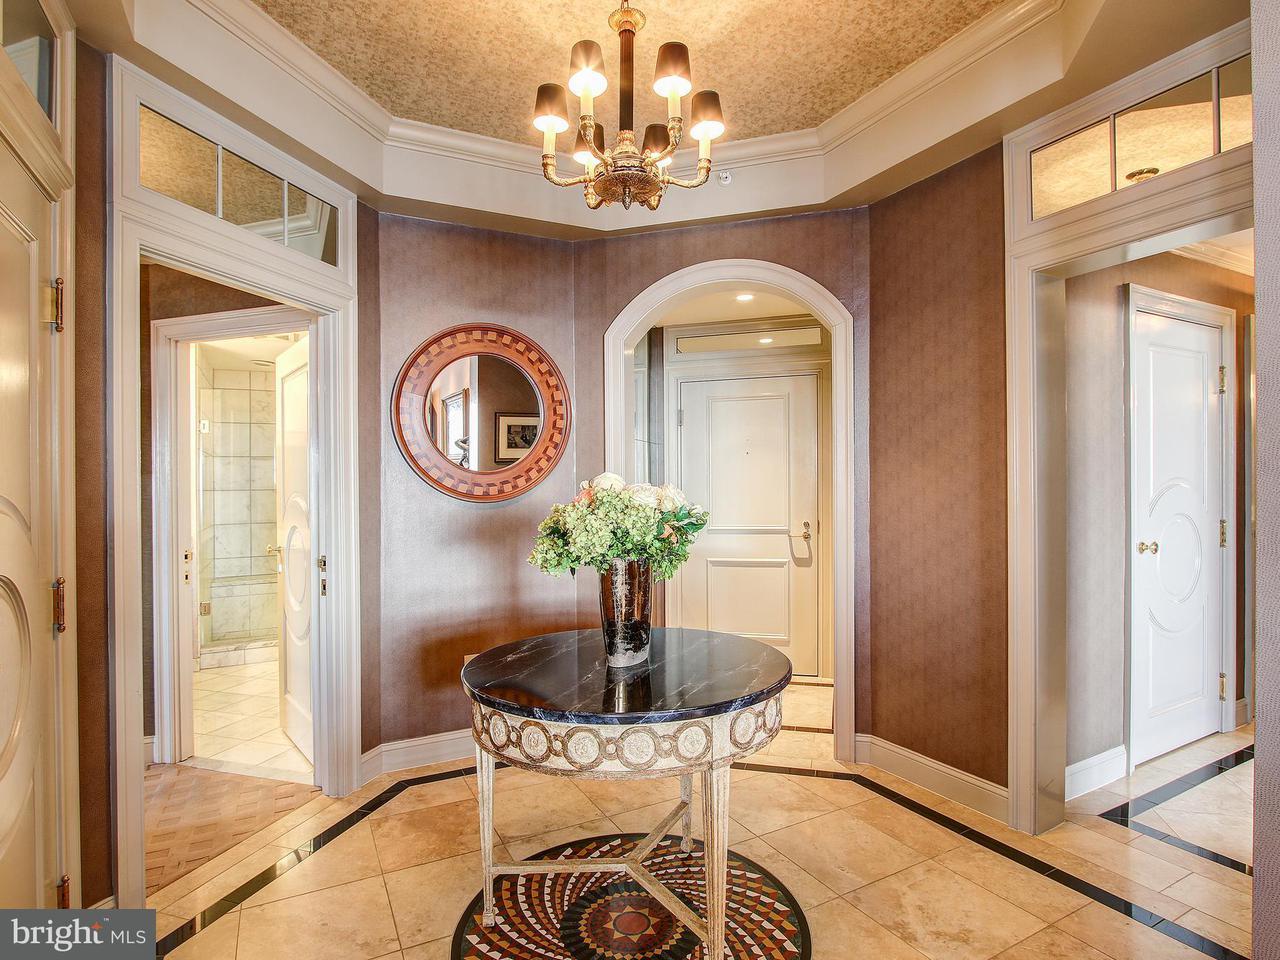 Condominium for Sale at 11776 Stratford House Pl #1402 11776 Stratford House Pl #1402 Reston, Virginia 20190 United States